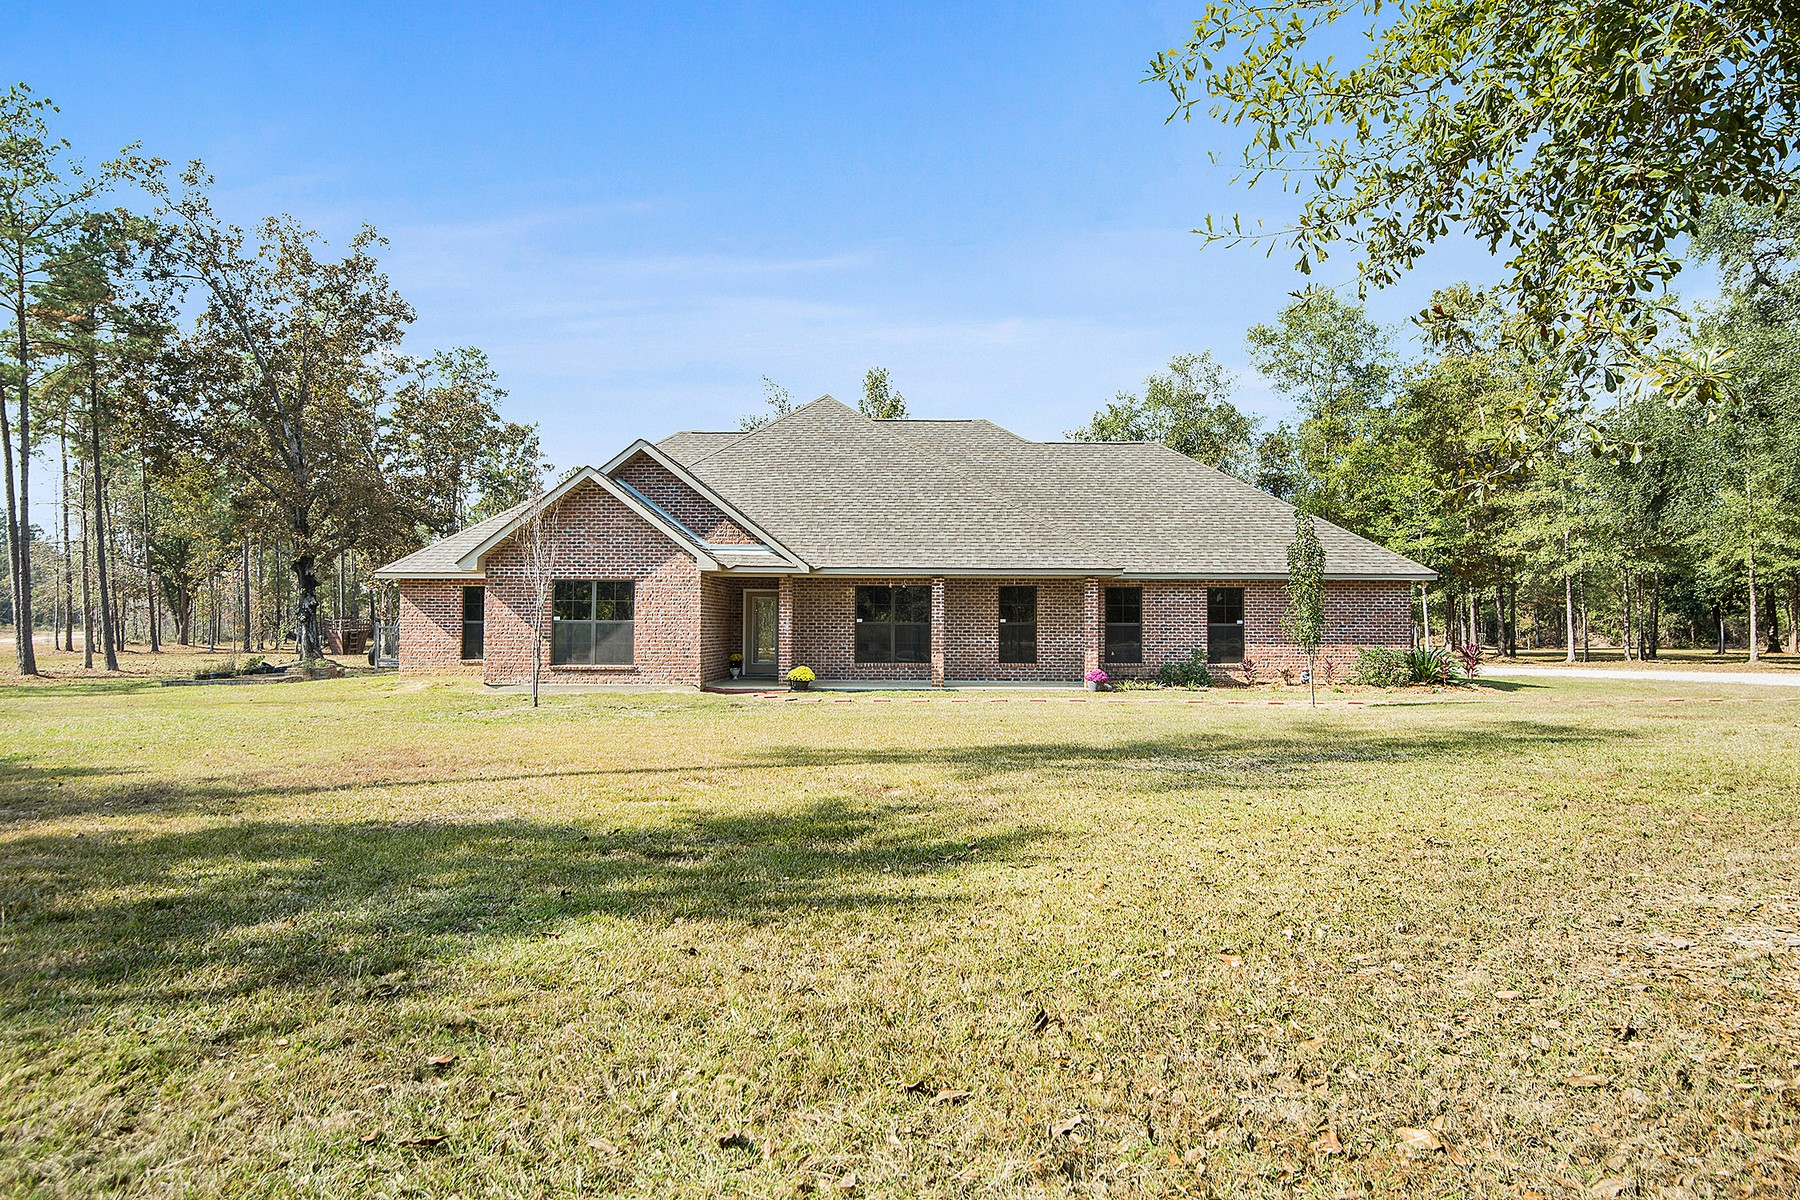 Single Family Home for Sale at 31349 Hartley Road 31349 Hartley Rd Bush, Louisiana, 70431 United States